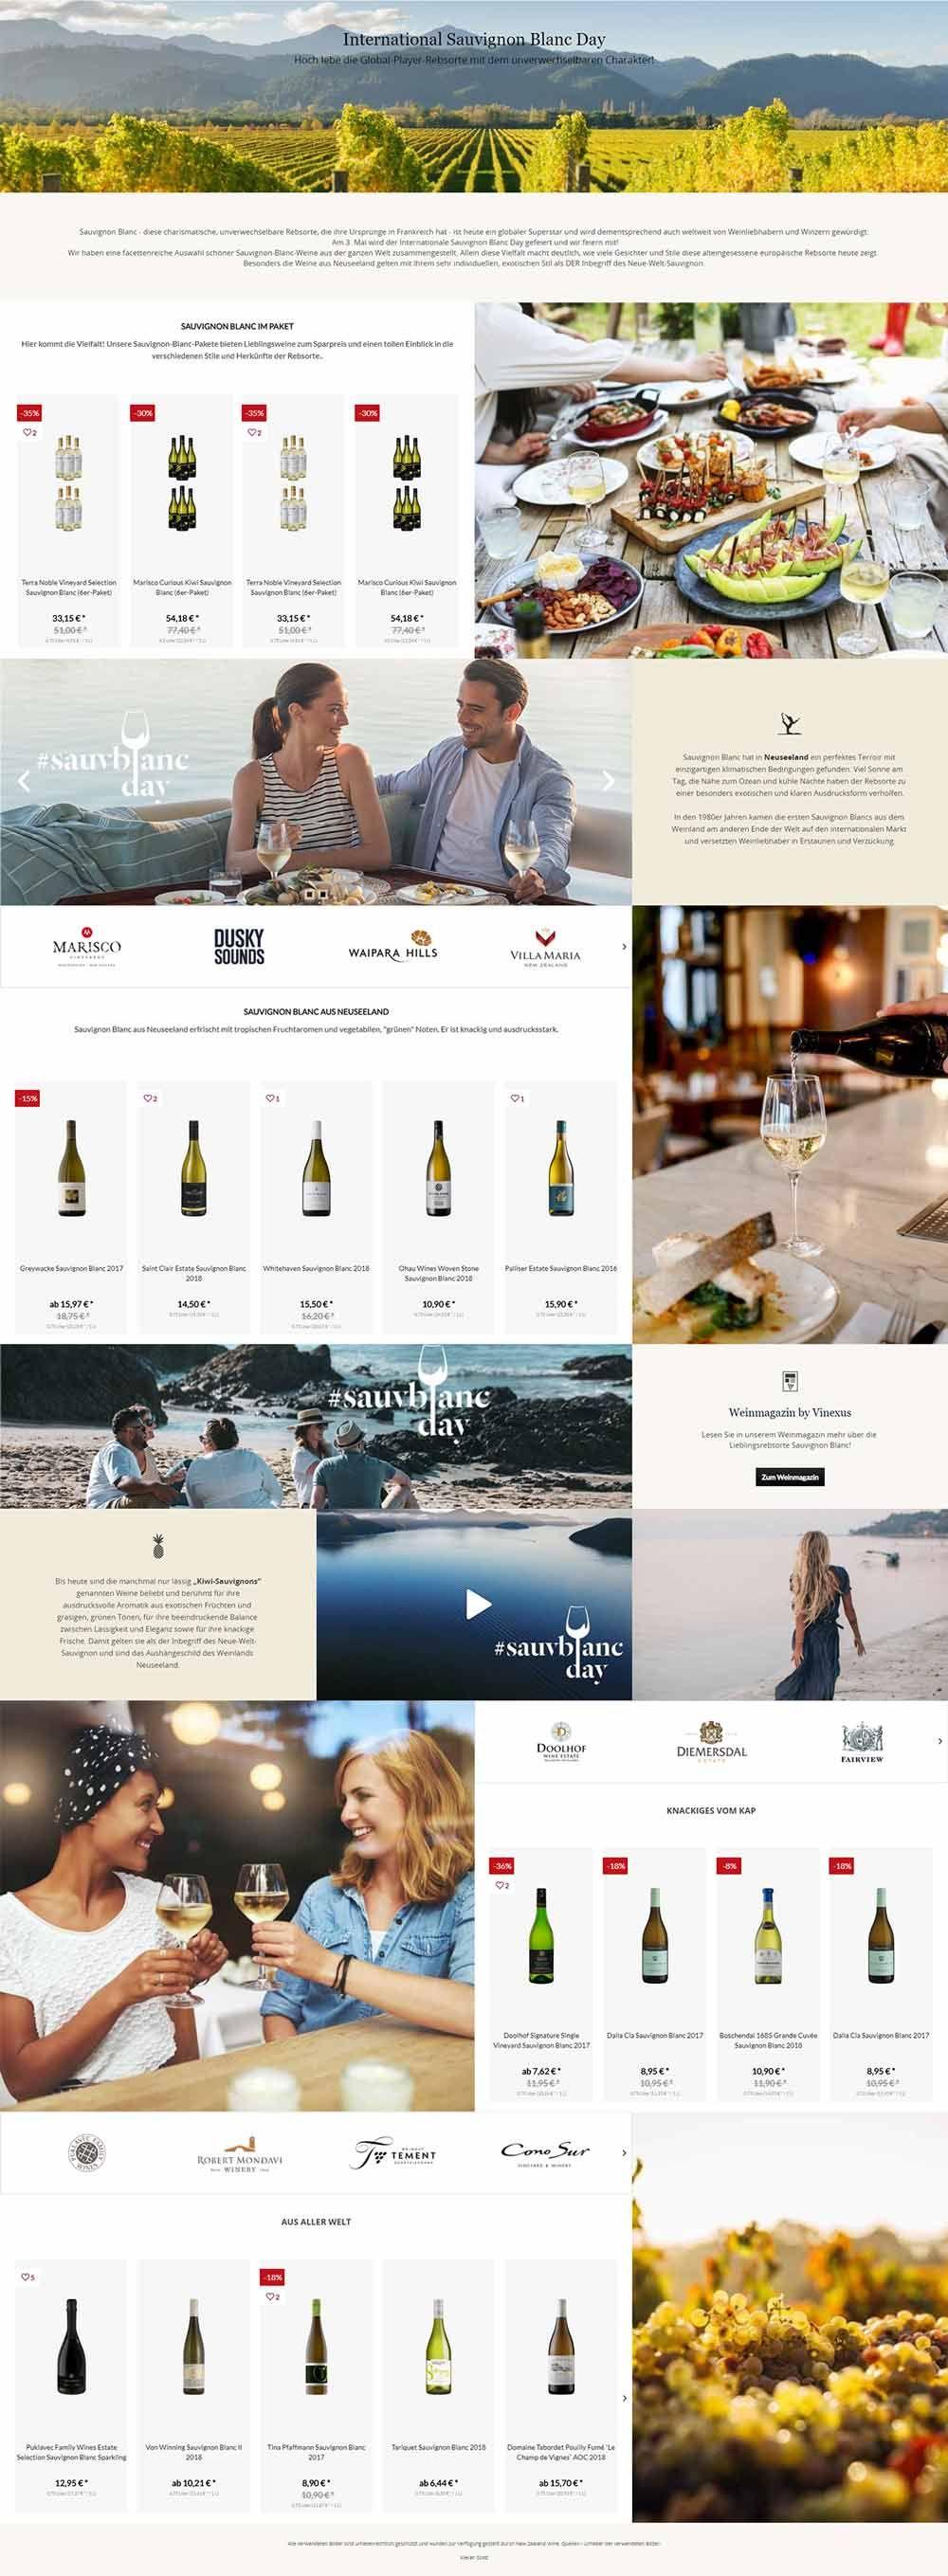 Vinexus Sauvignon Blanc Day Landingpage